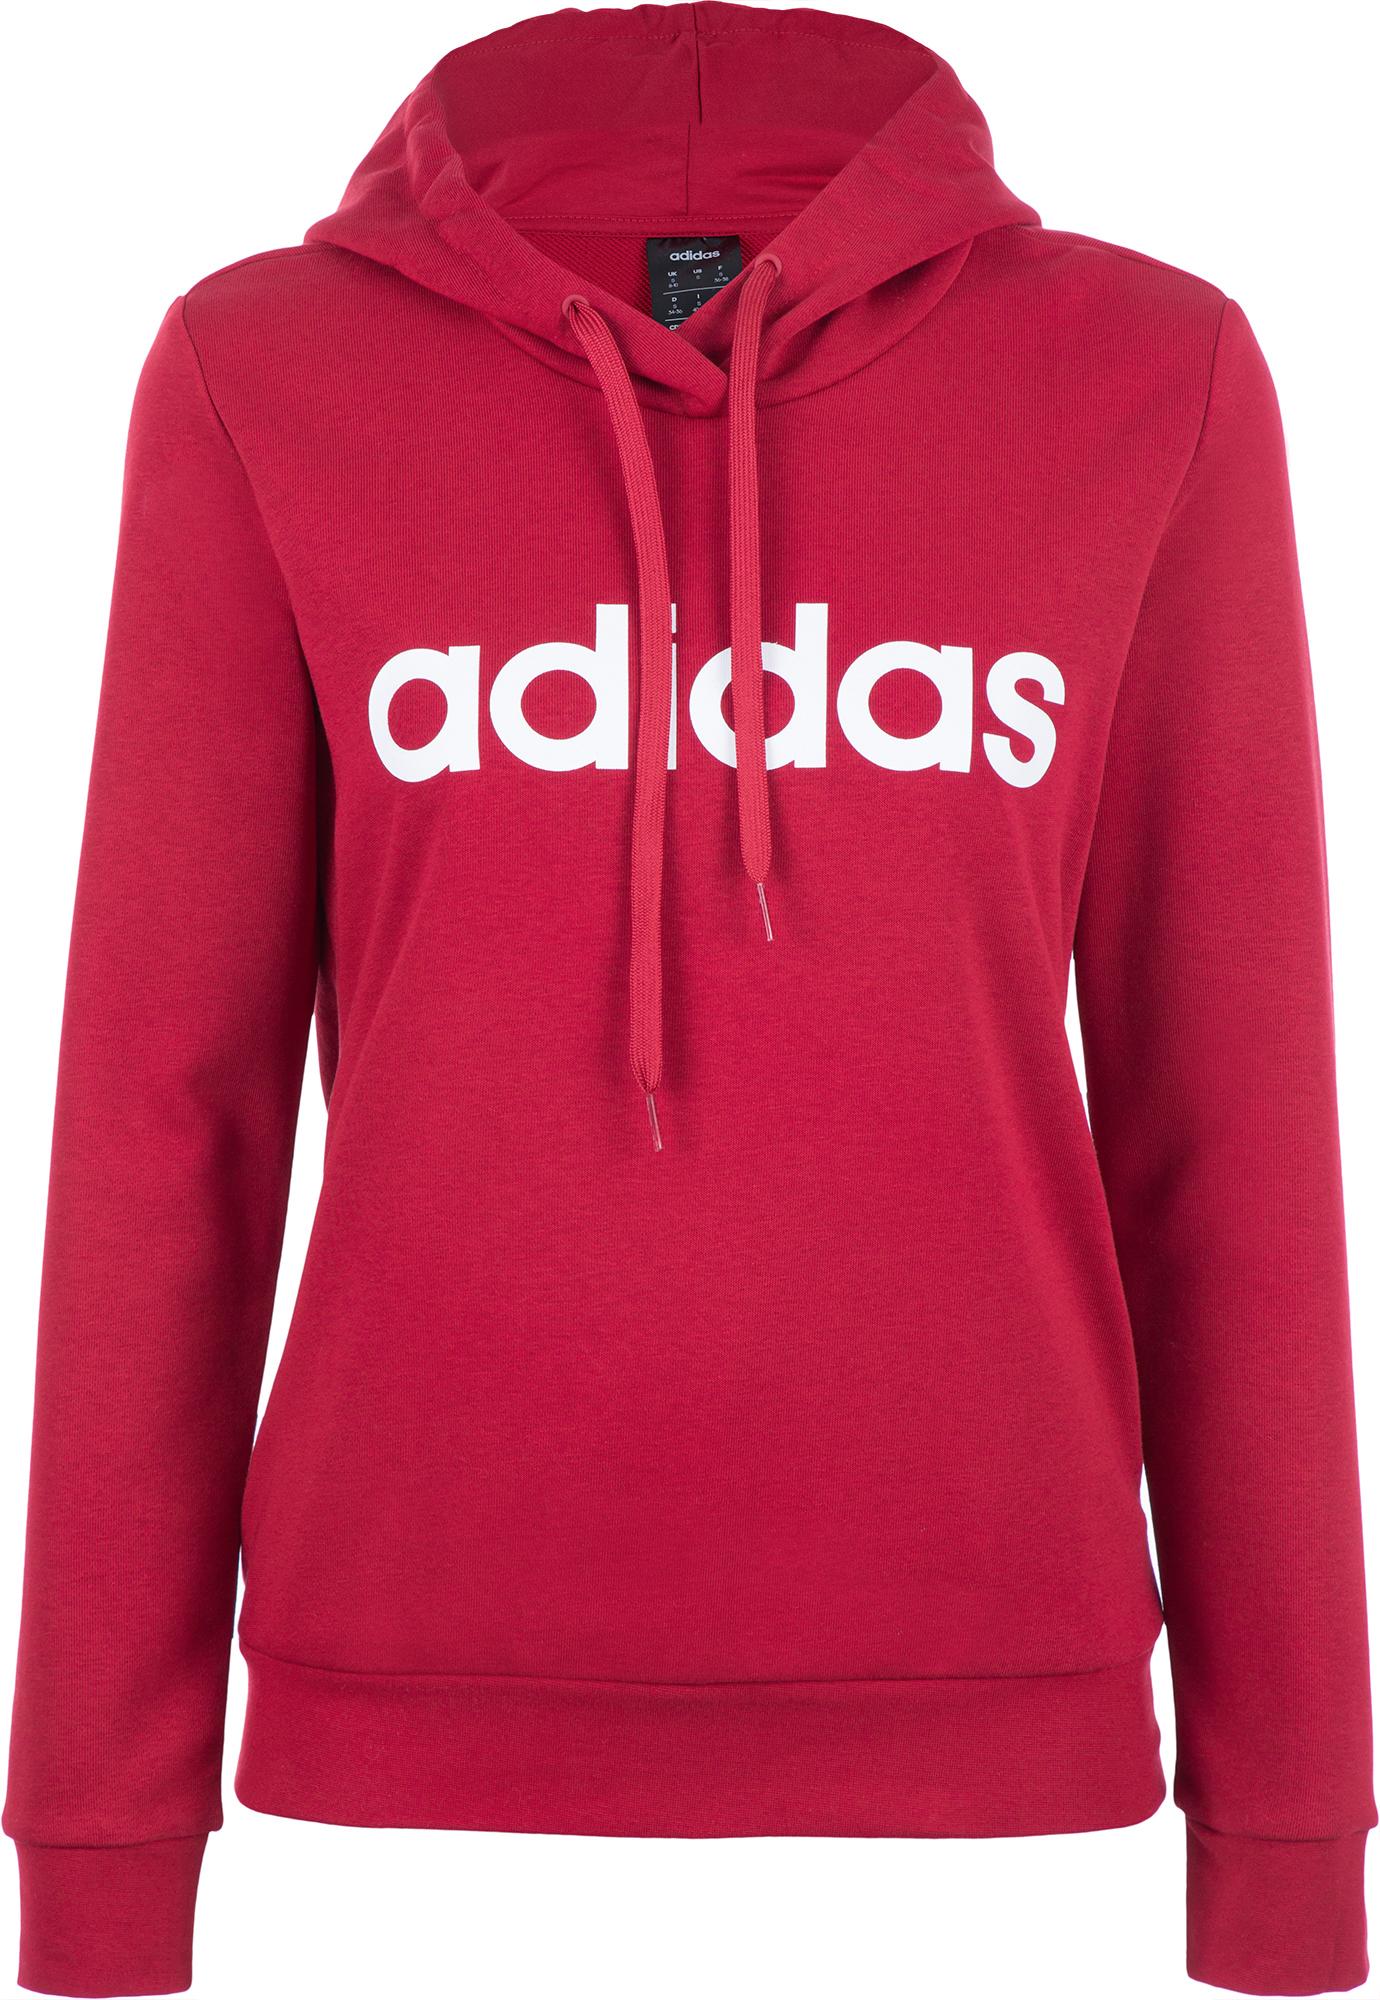 Adidas Худи женская Adidas Essentials Linear, размер 40